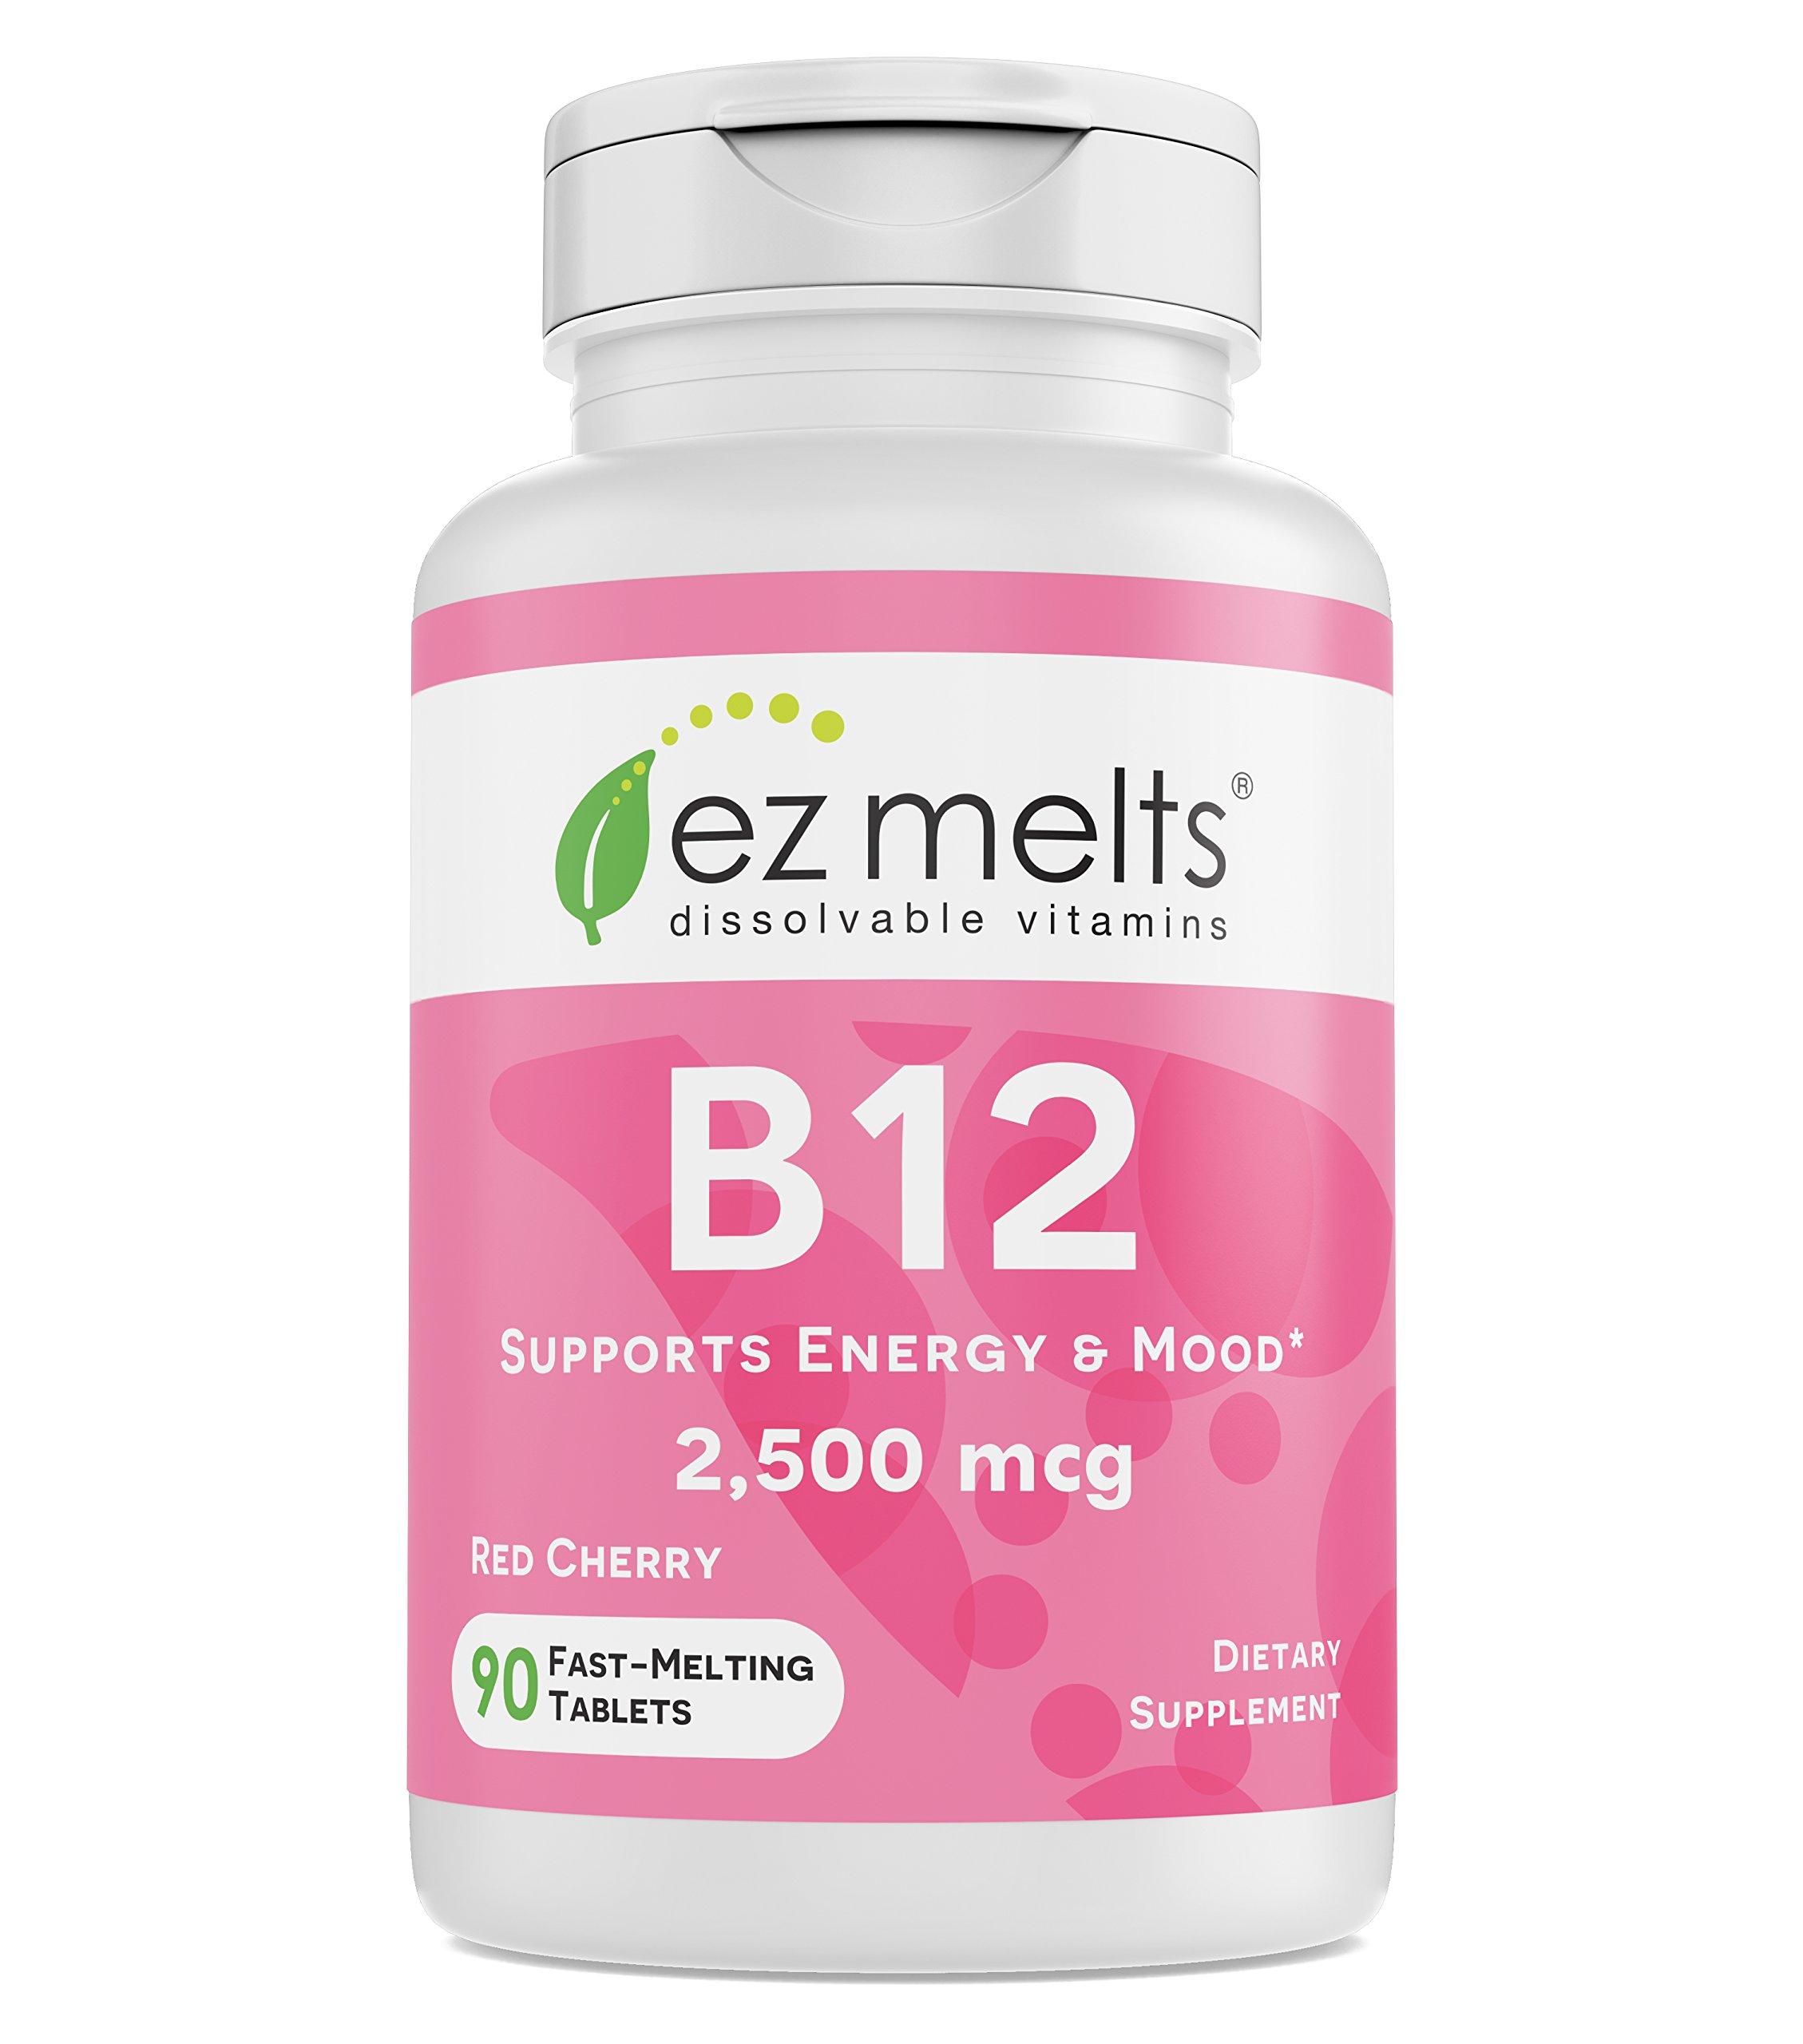 EZ Melts B12 as Methylcobalamin, 2,500 mcg, Sublingual Vitamins, Vegan, Zero Sugar, Natural Cherry Flavor, 90 Fast Dissolve Tablets by EZ Melts